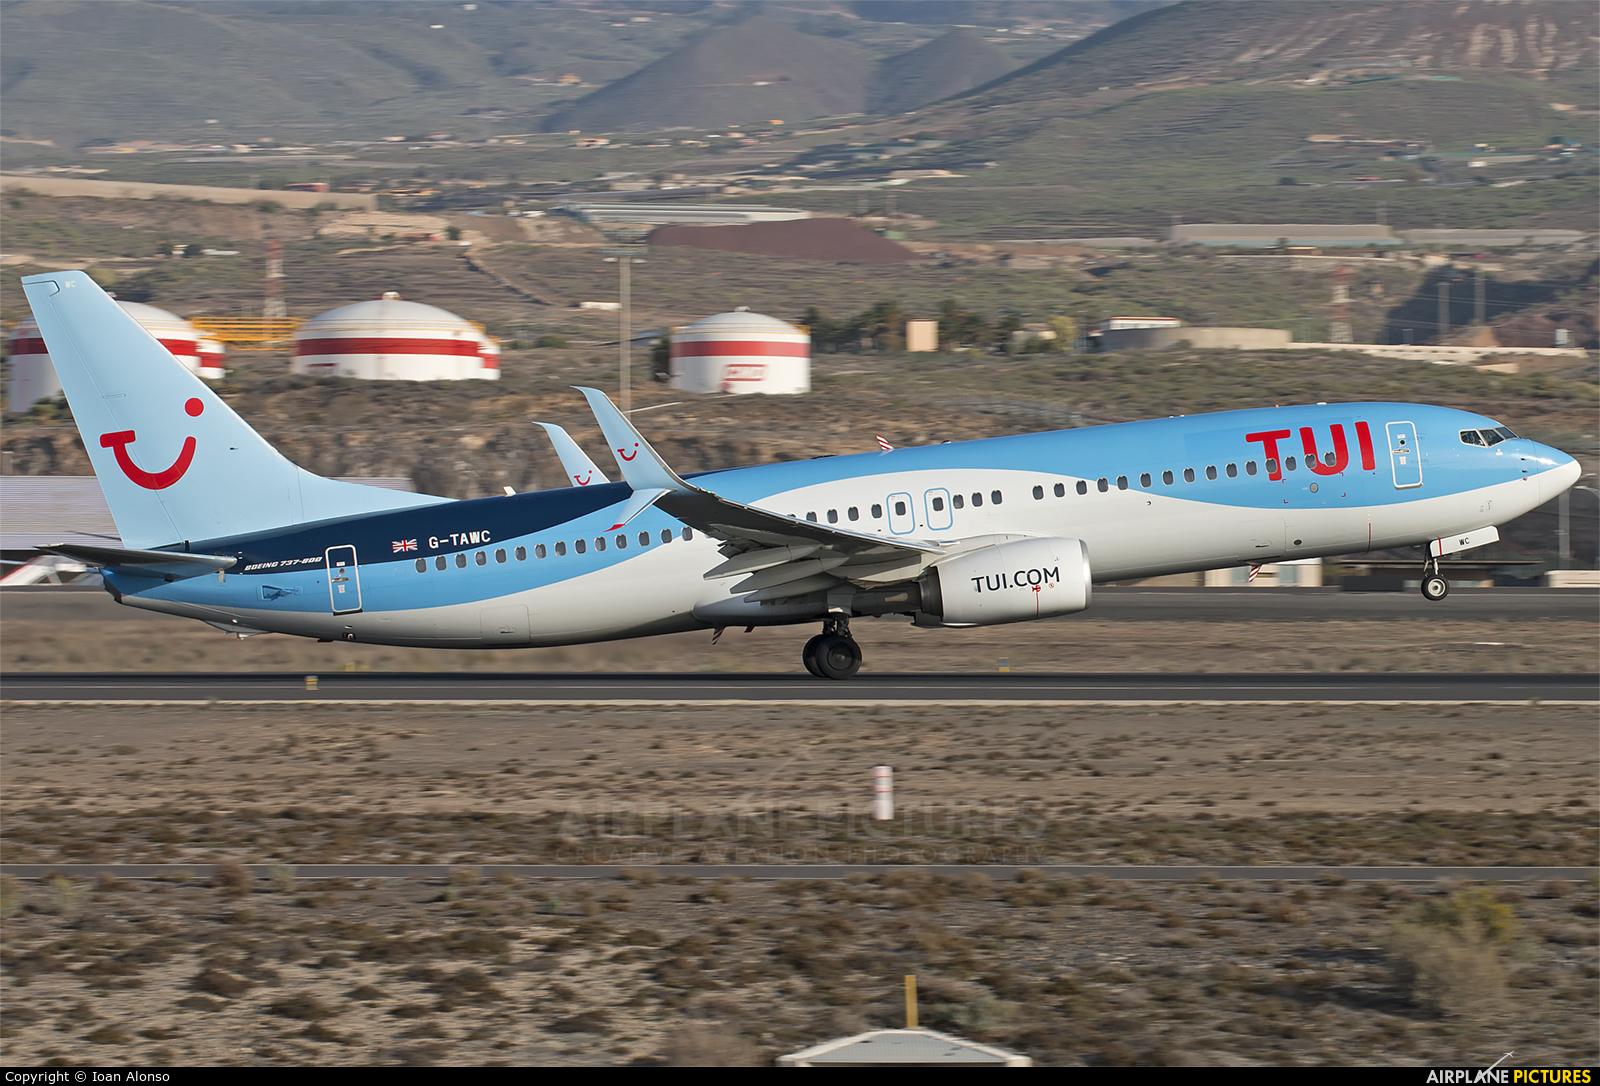 TUI Airways G-TAWC aircraft at Tenerife Sur - Reina Sofia